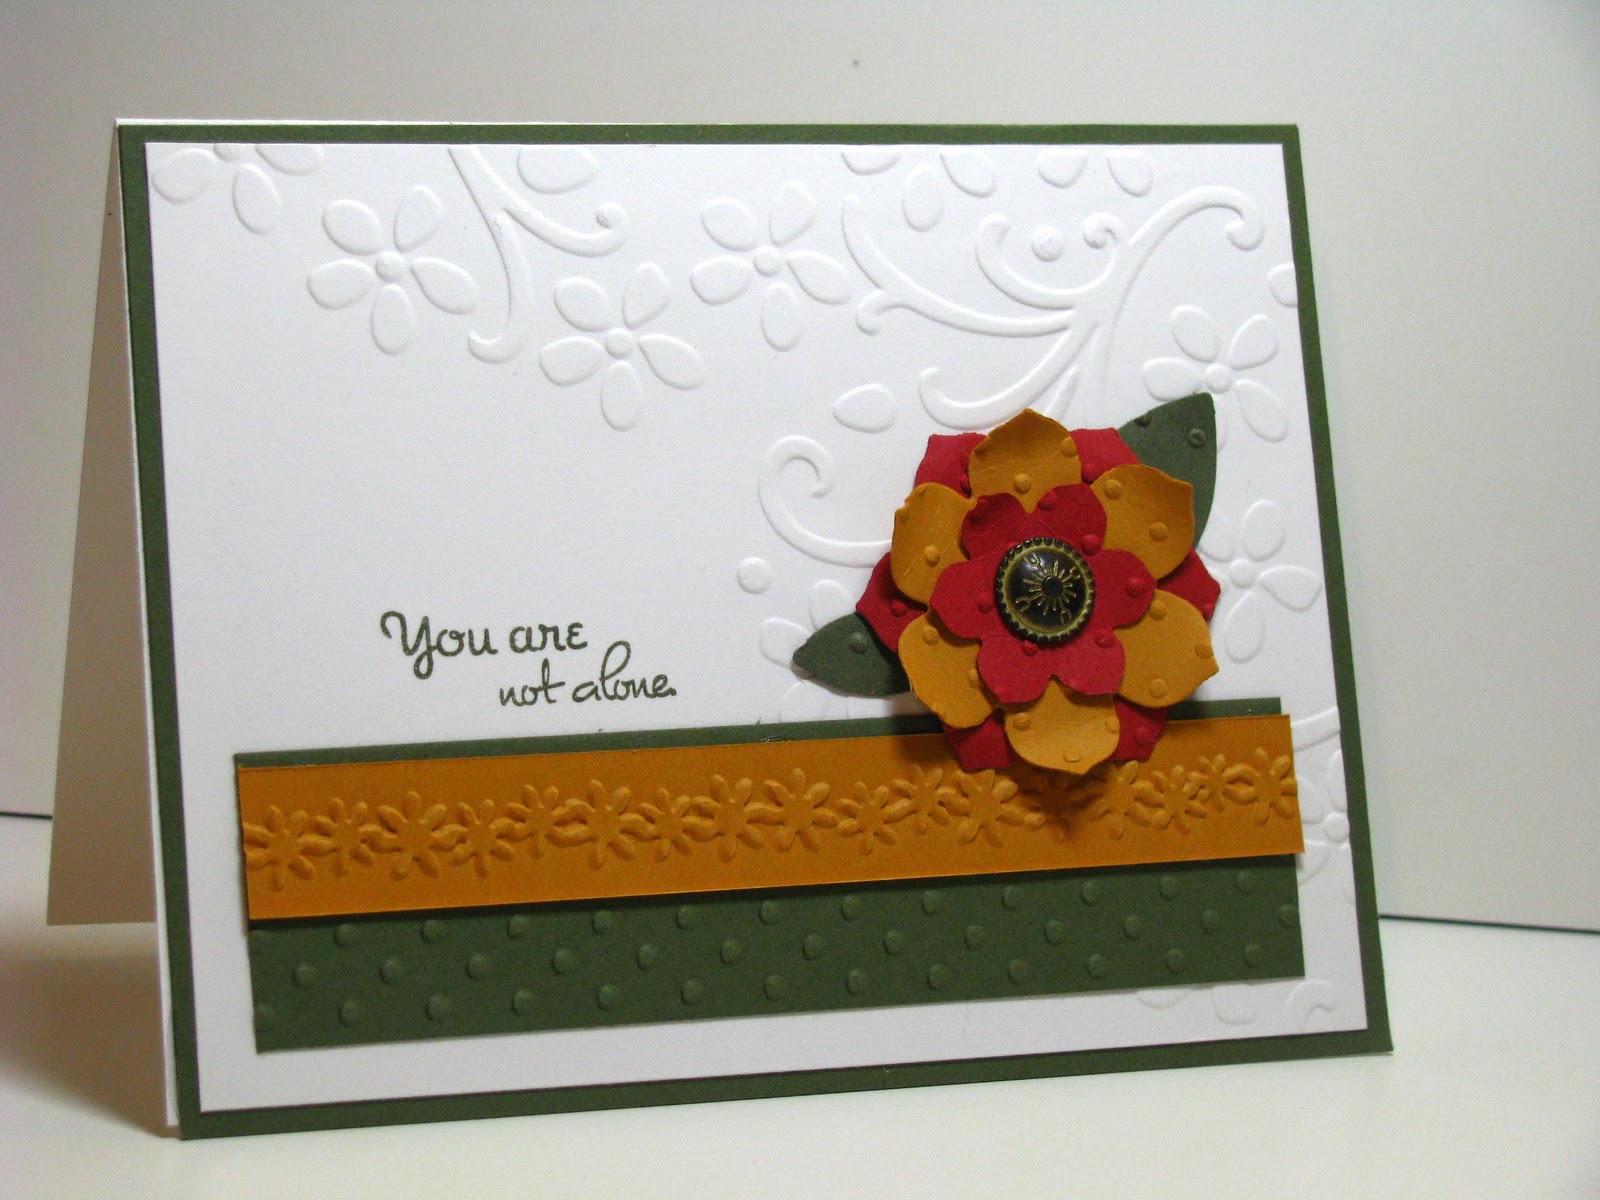 Card Making Ideas Using Cuttlebug Part - 25: Emboss On Die Cuts. Folders: Stampinu0027 Up Corner Flowers And Polka Dots,  Cuttlebug Border Folder